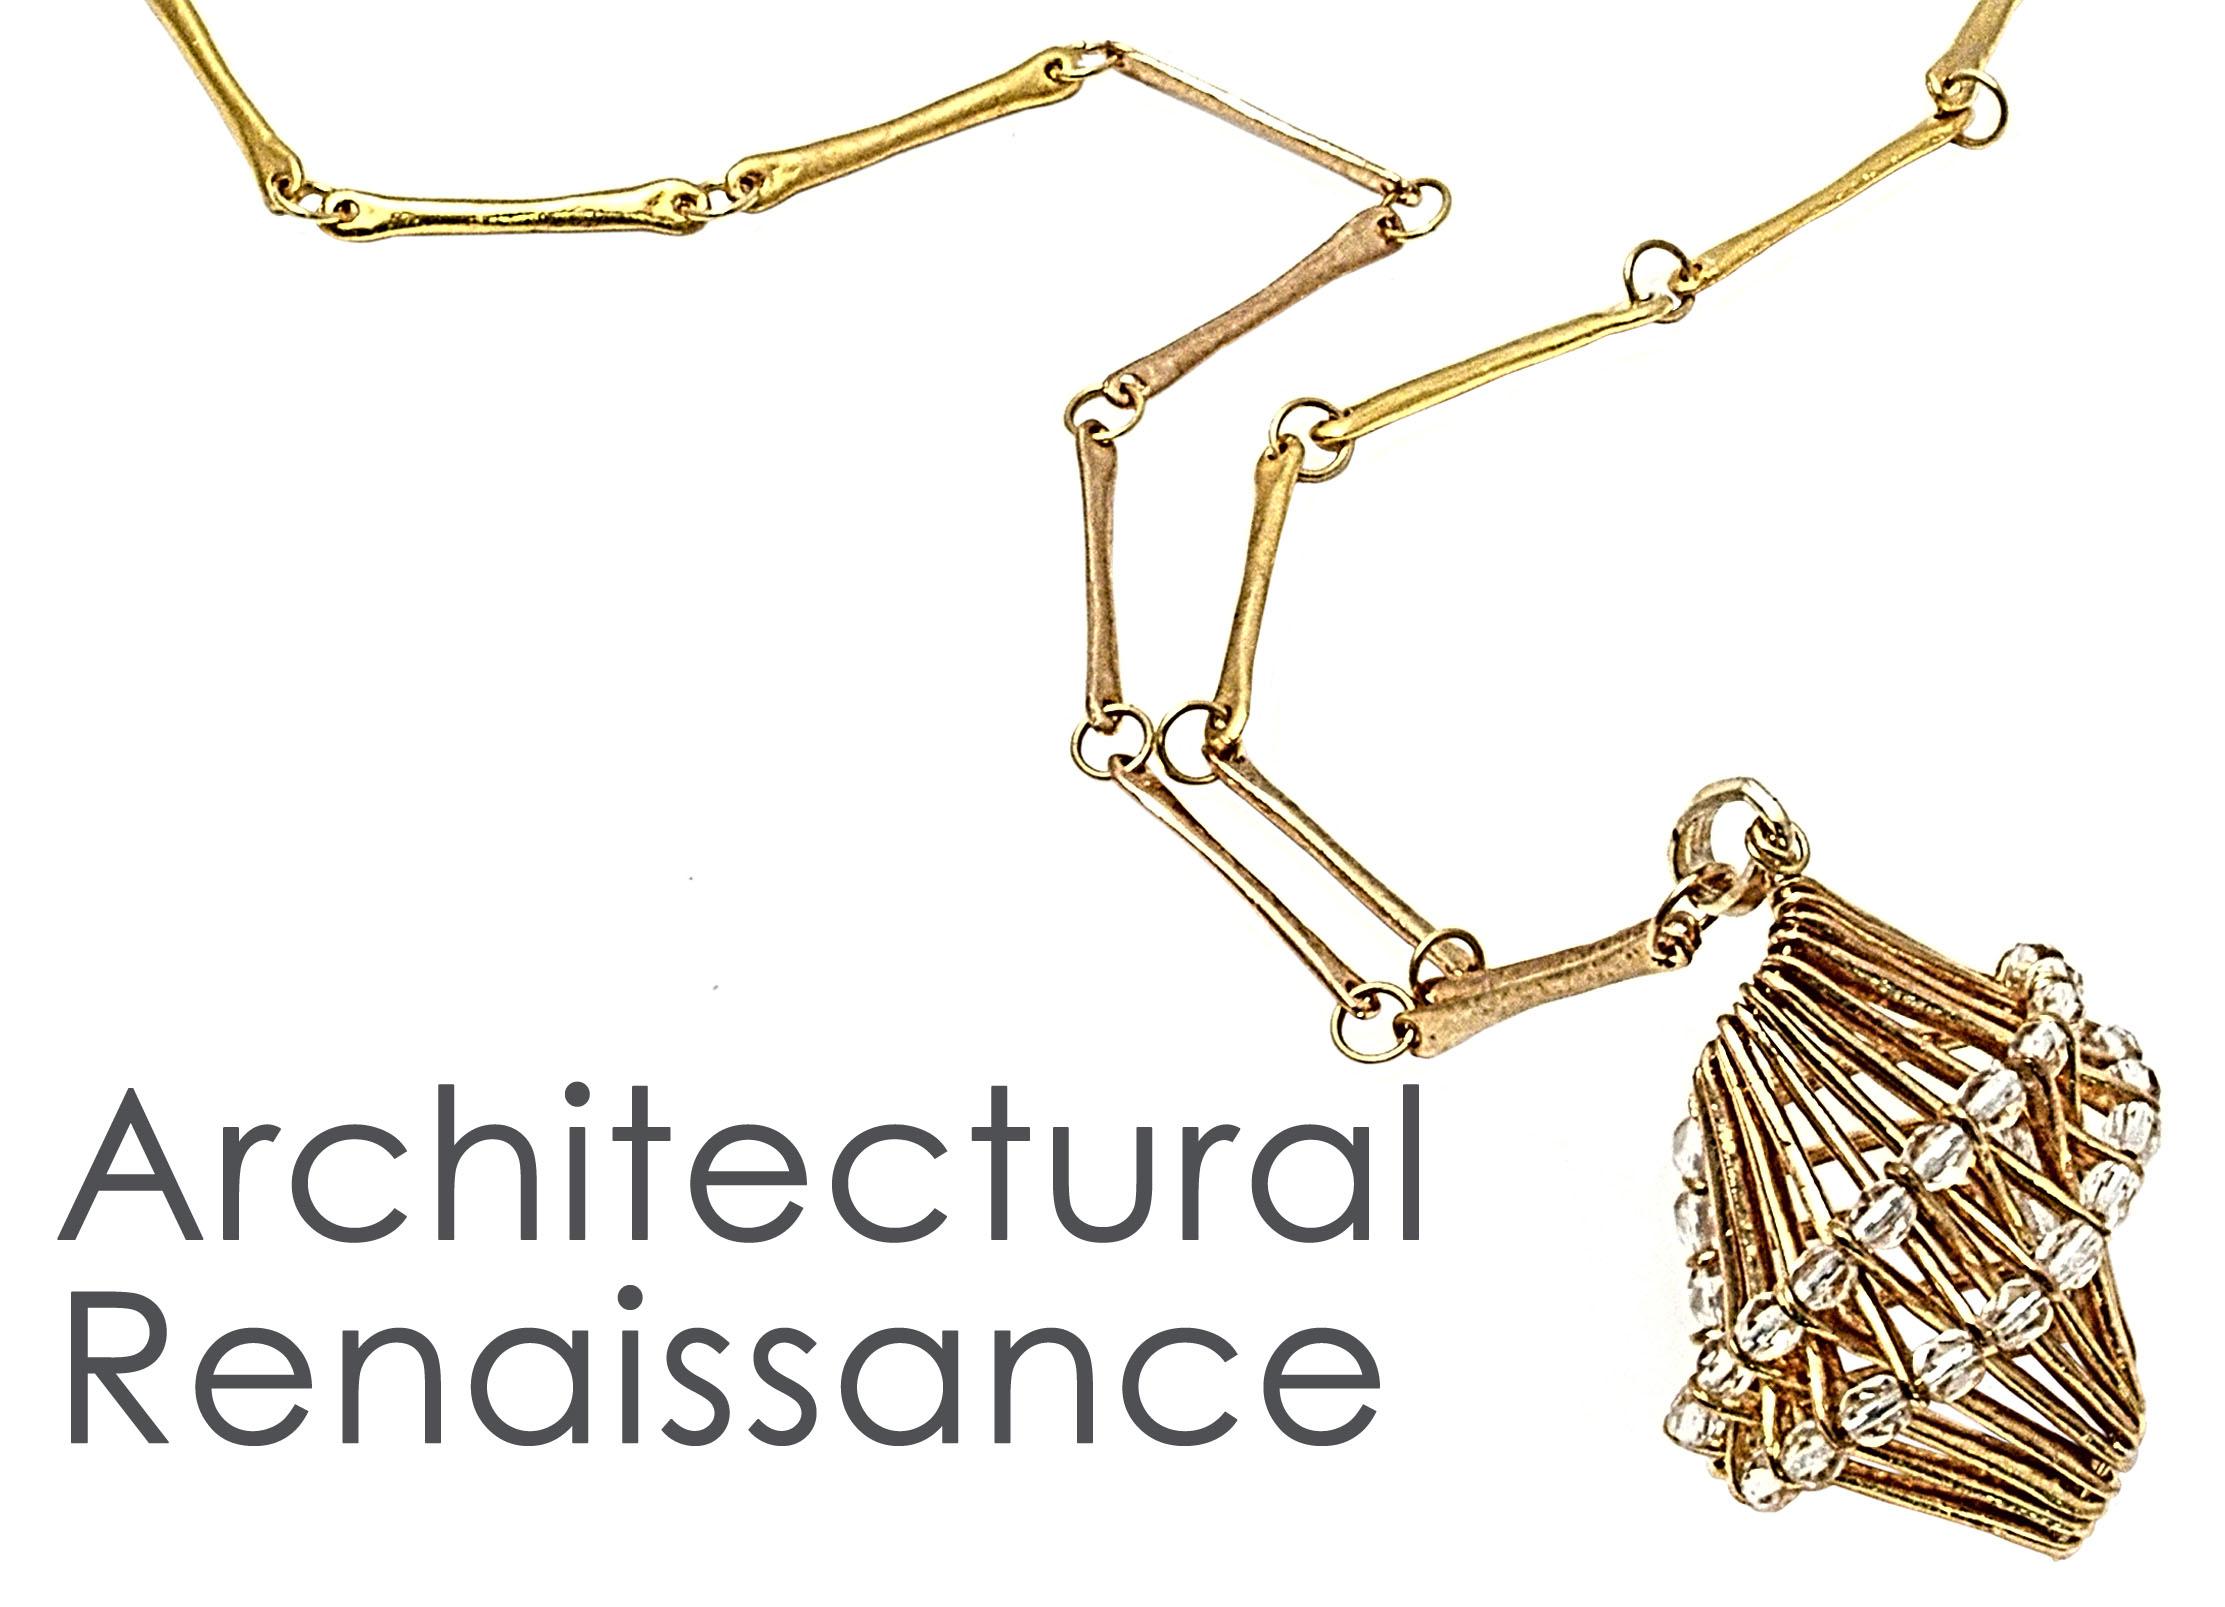 Architectural renaissance.jpg